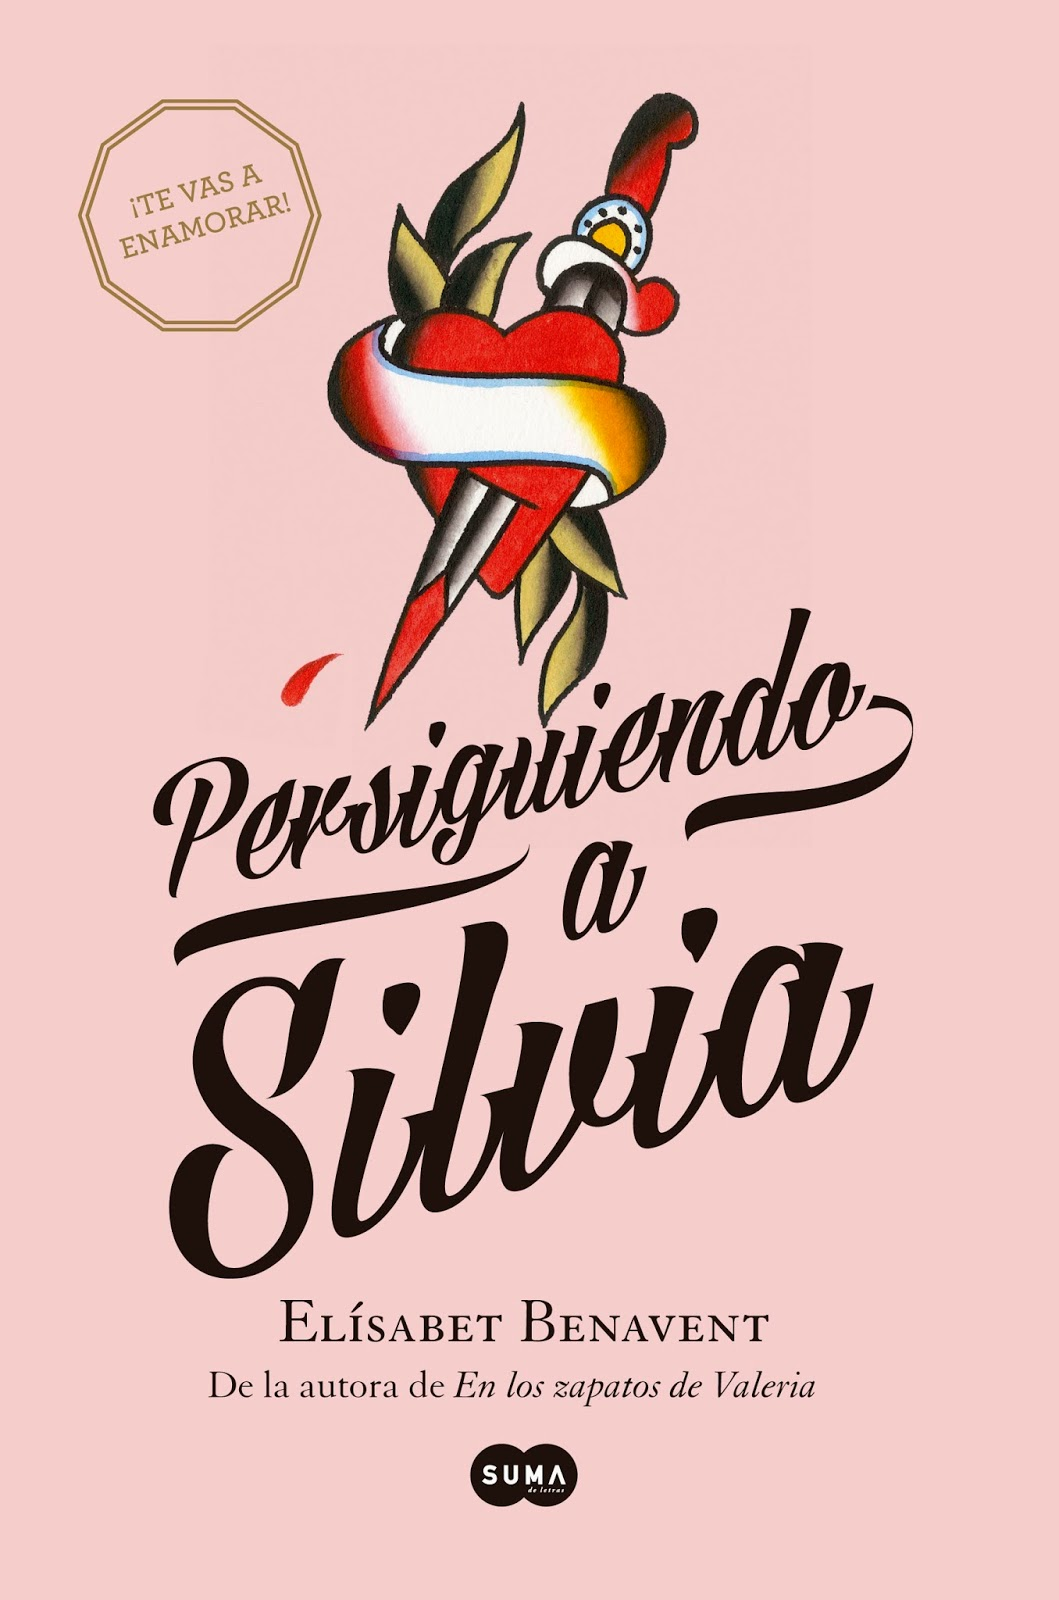 http://labibliotecadebella.blogspot.com.es/2015/06/persiguiendo-silvia-elisabet-benavent.html